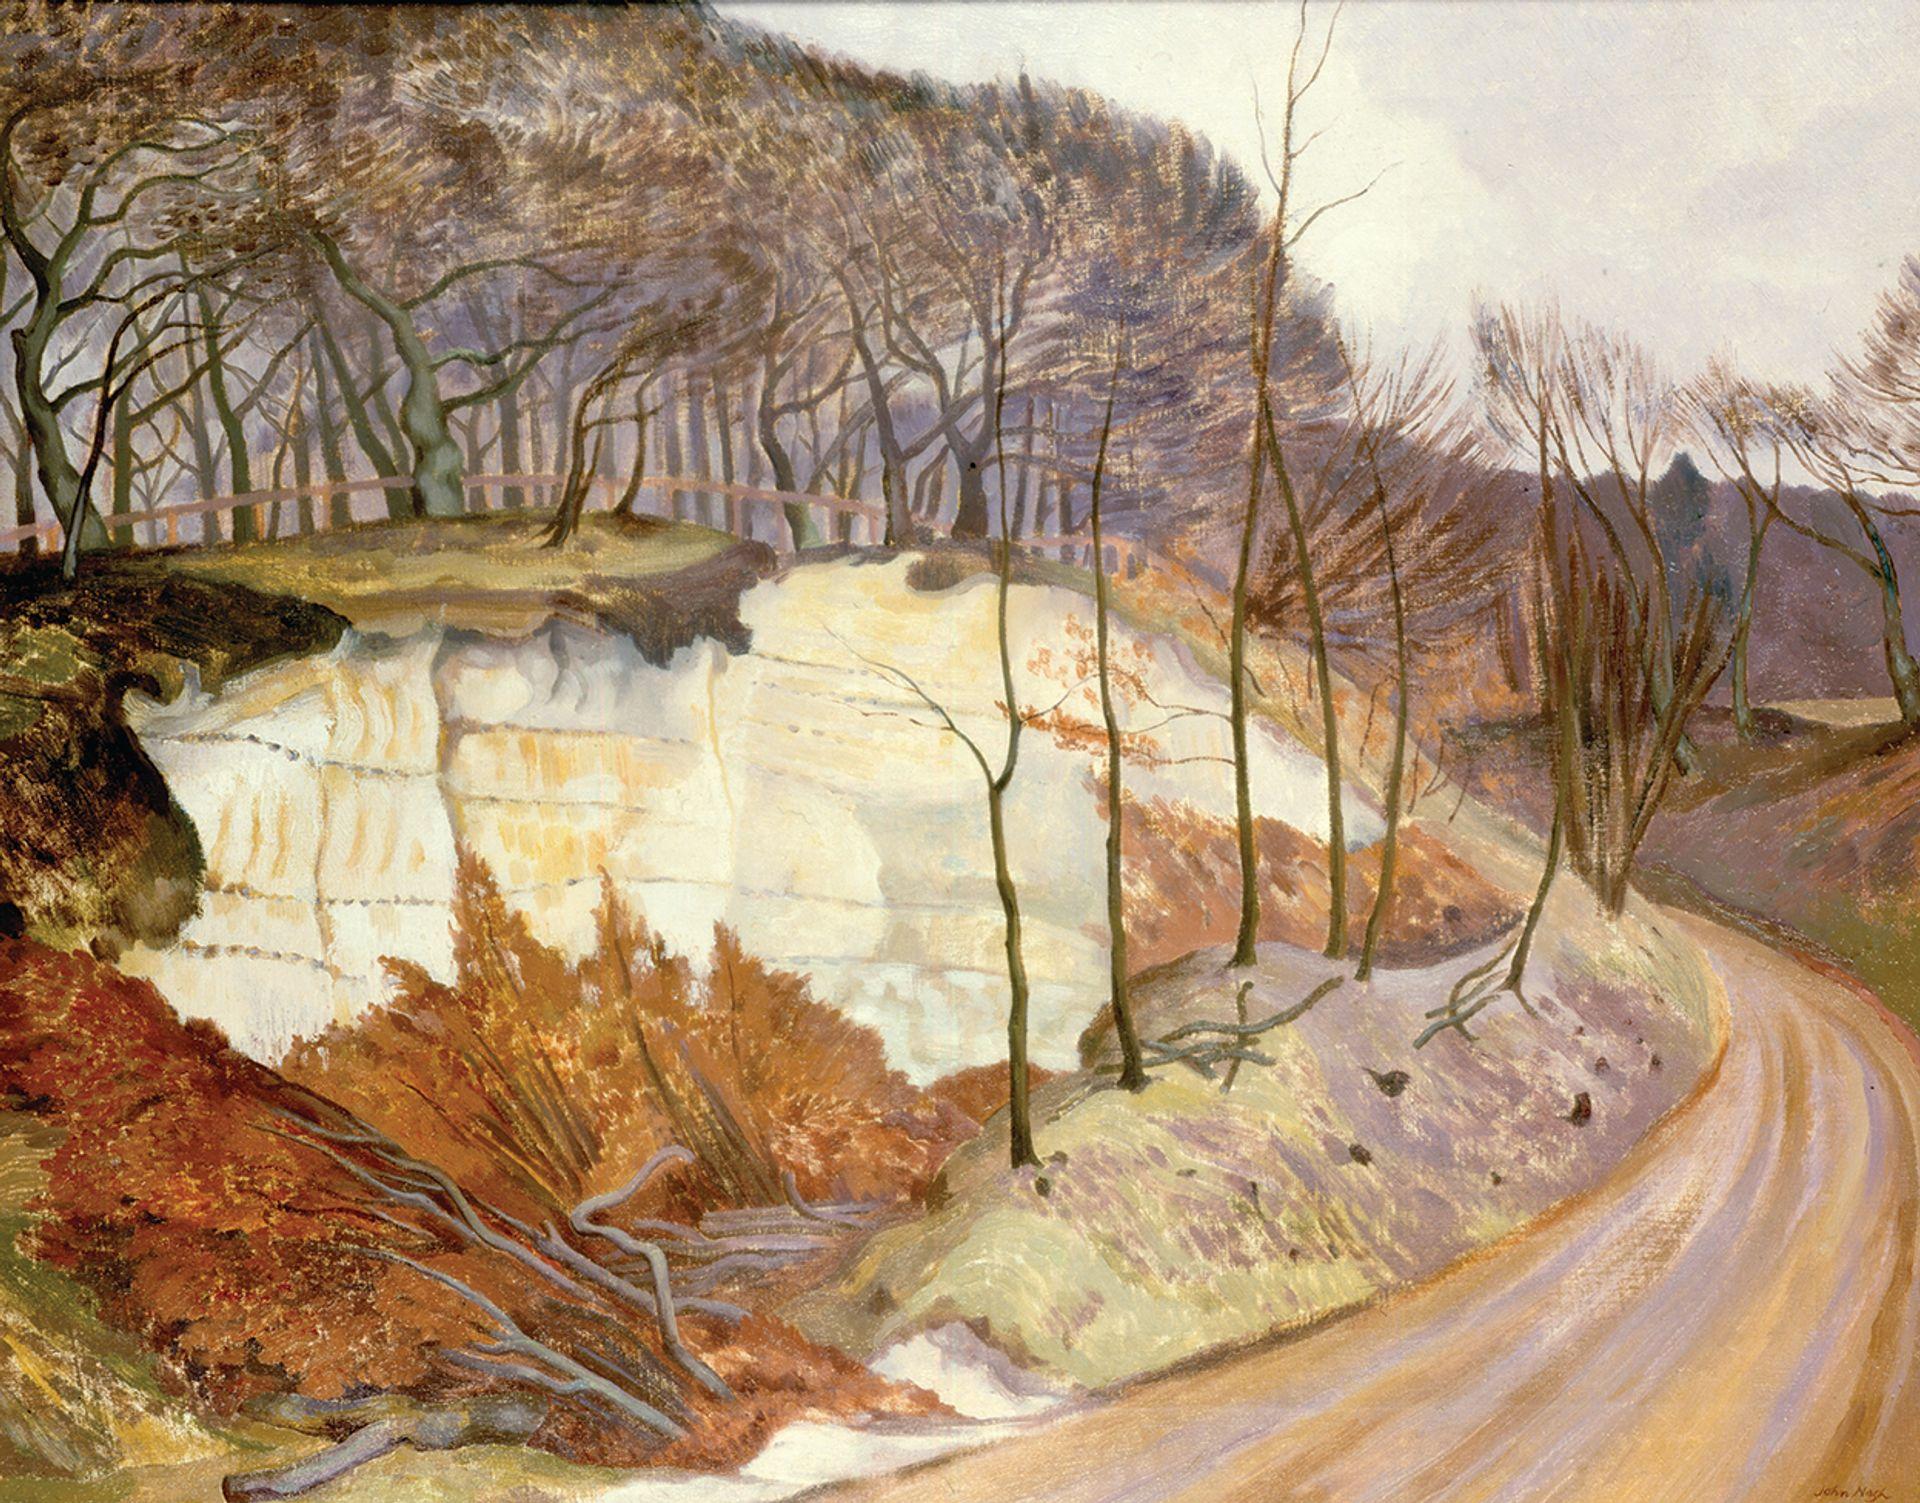 Nash's rhythmic patterning of trees against the light: Chalkpits, Whiteleaf (1923) ING UK collection, © The Estate of John Nash